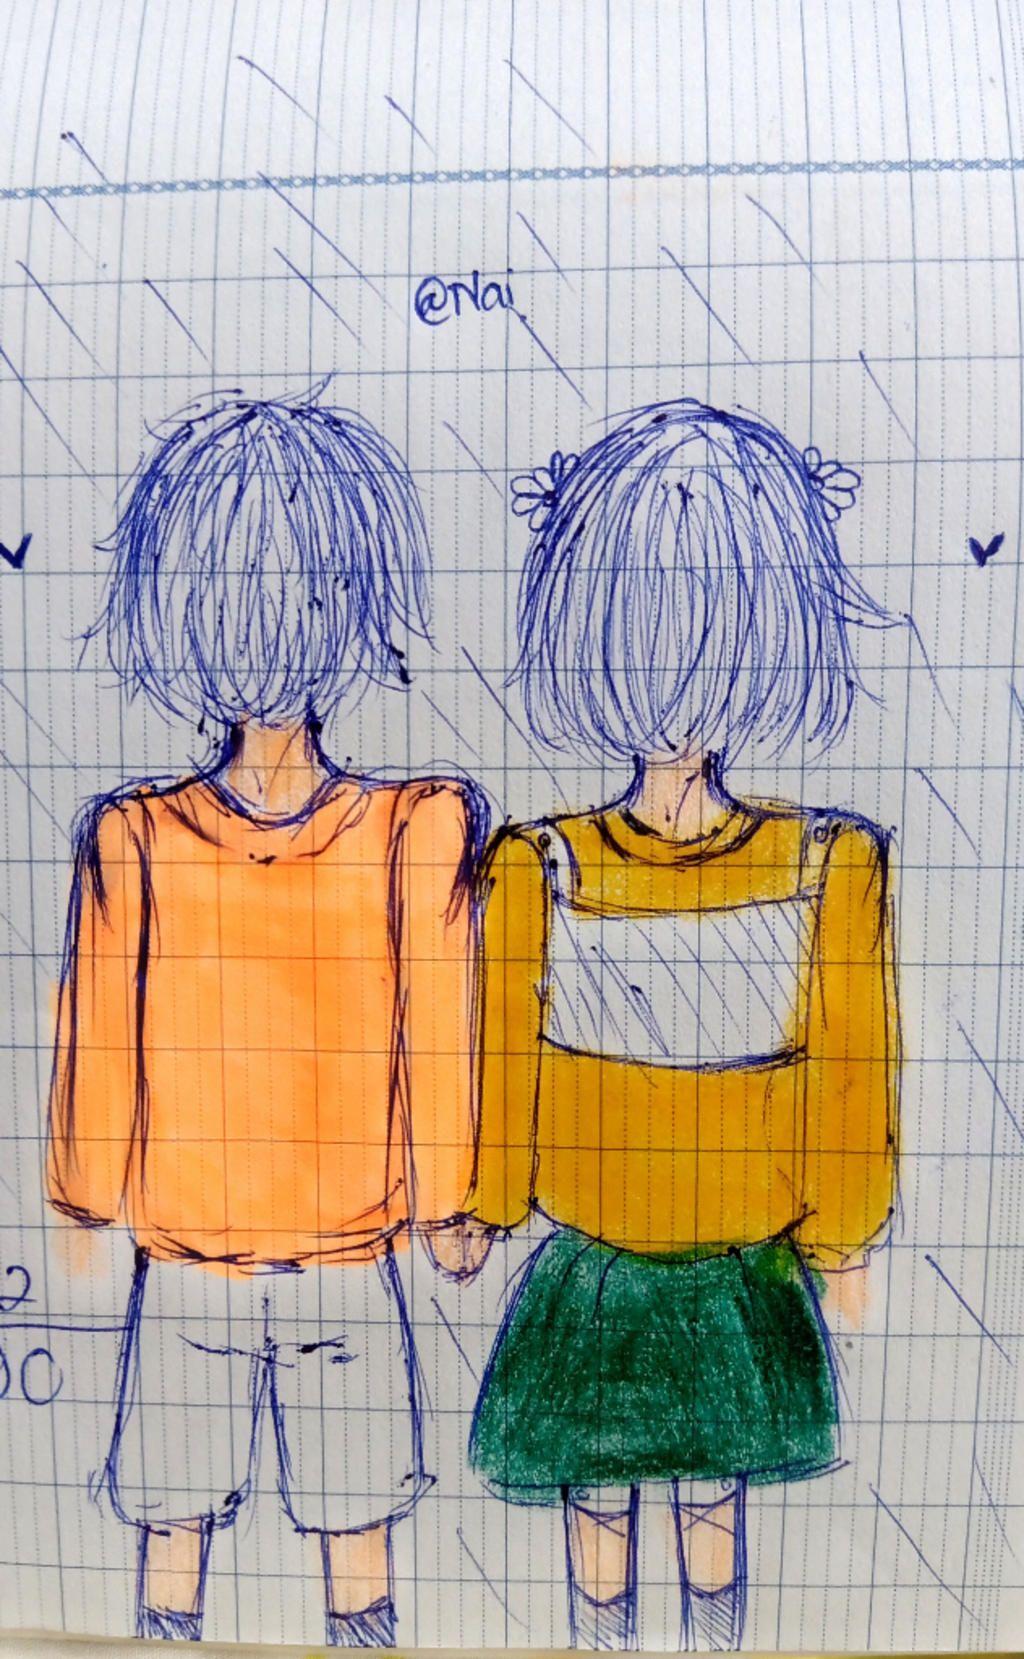 ve-mot-cap-avatar-anime-kieu-nam-chat-tay-anh-anh-se-khong-de-em-mot-minh-nua-dau-ve-app-tay-thi